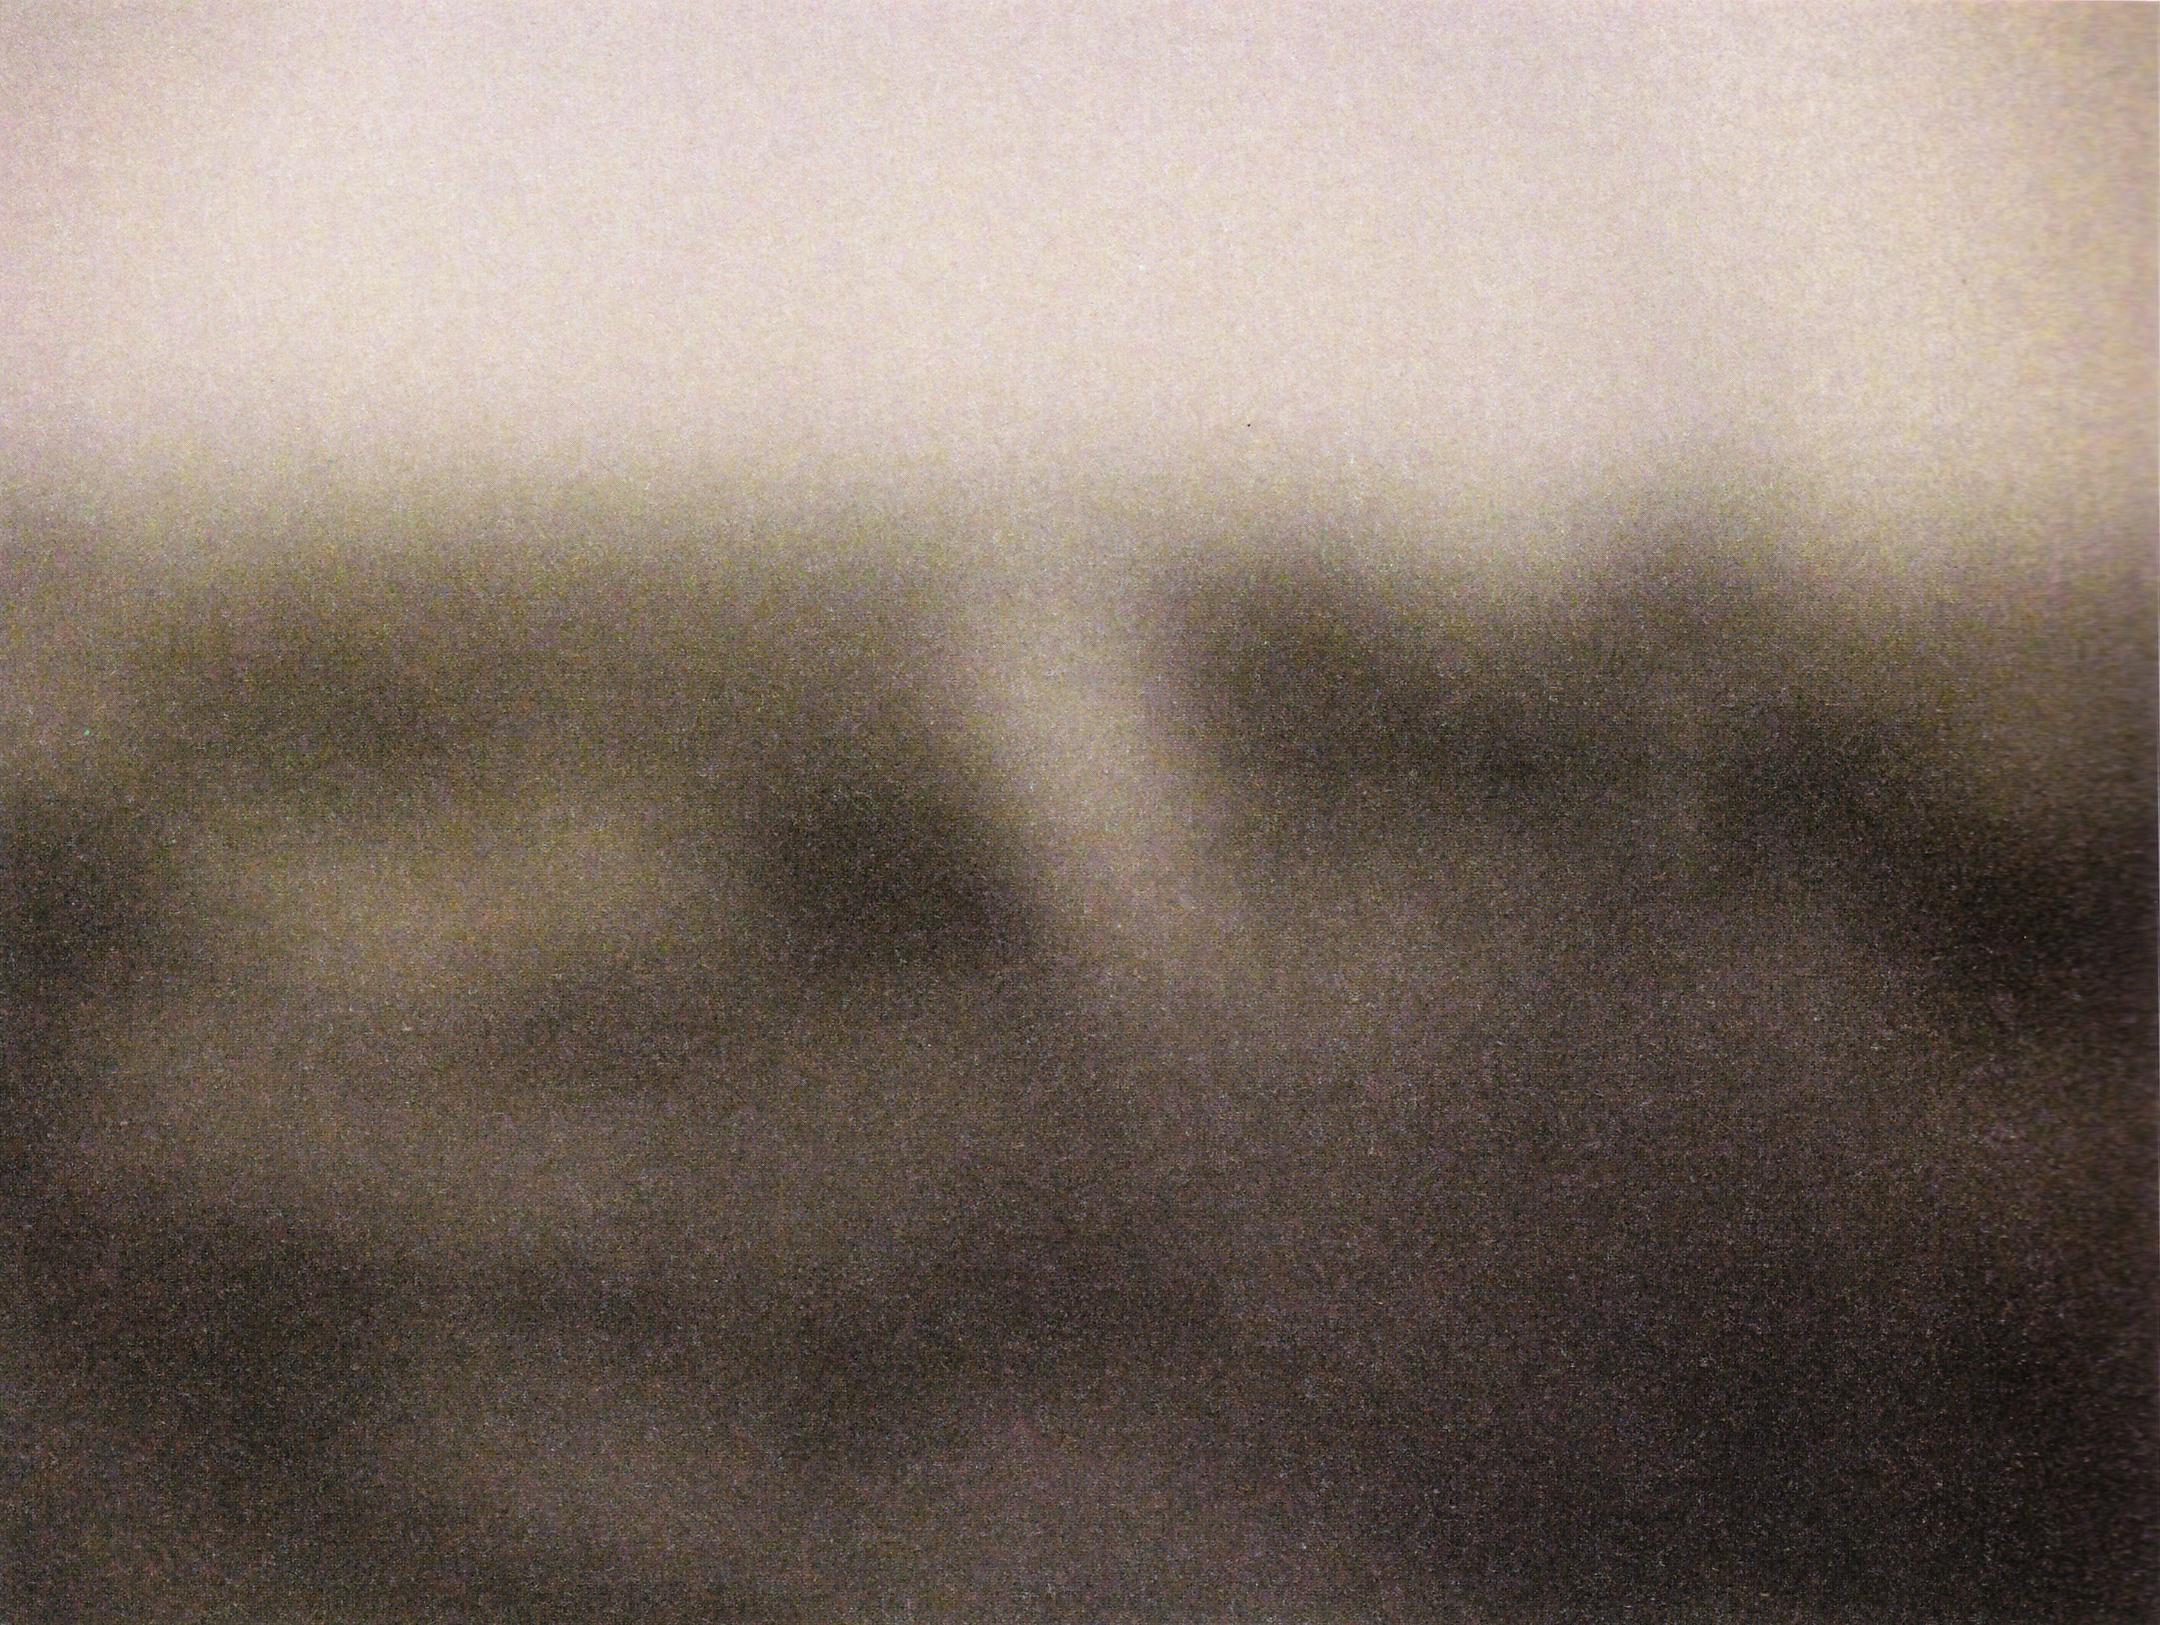 Peng Jian 彭剑, Landscape 7 风景之七, 2009, Photography 摄影